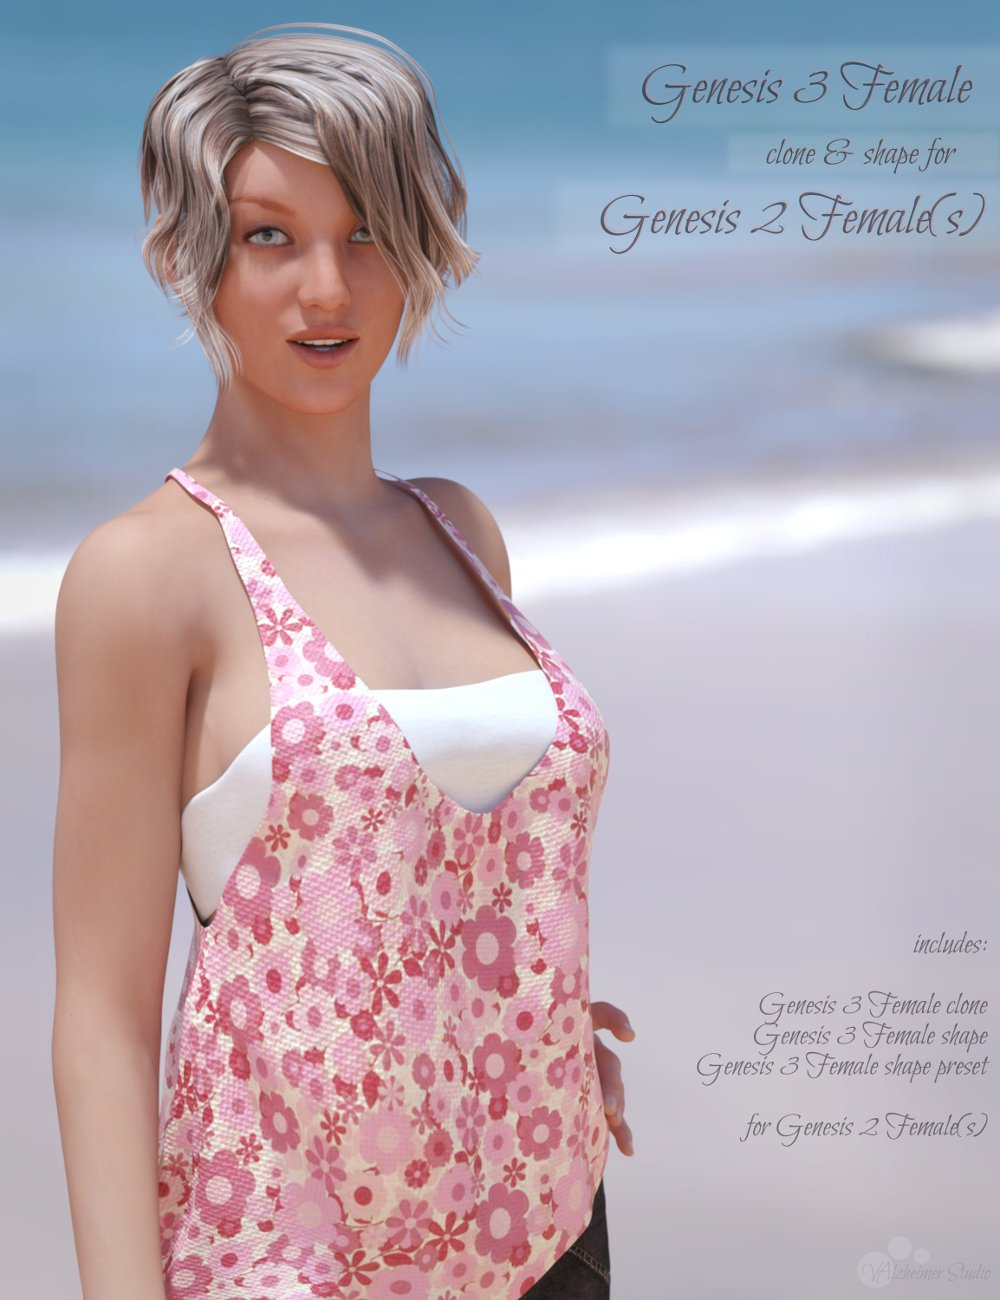 Genesis 3 Female for Genesis 2 Female(s) by: valzheimer, 3D Models by Daz 3D